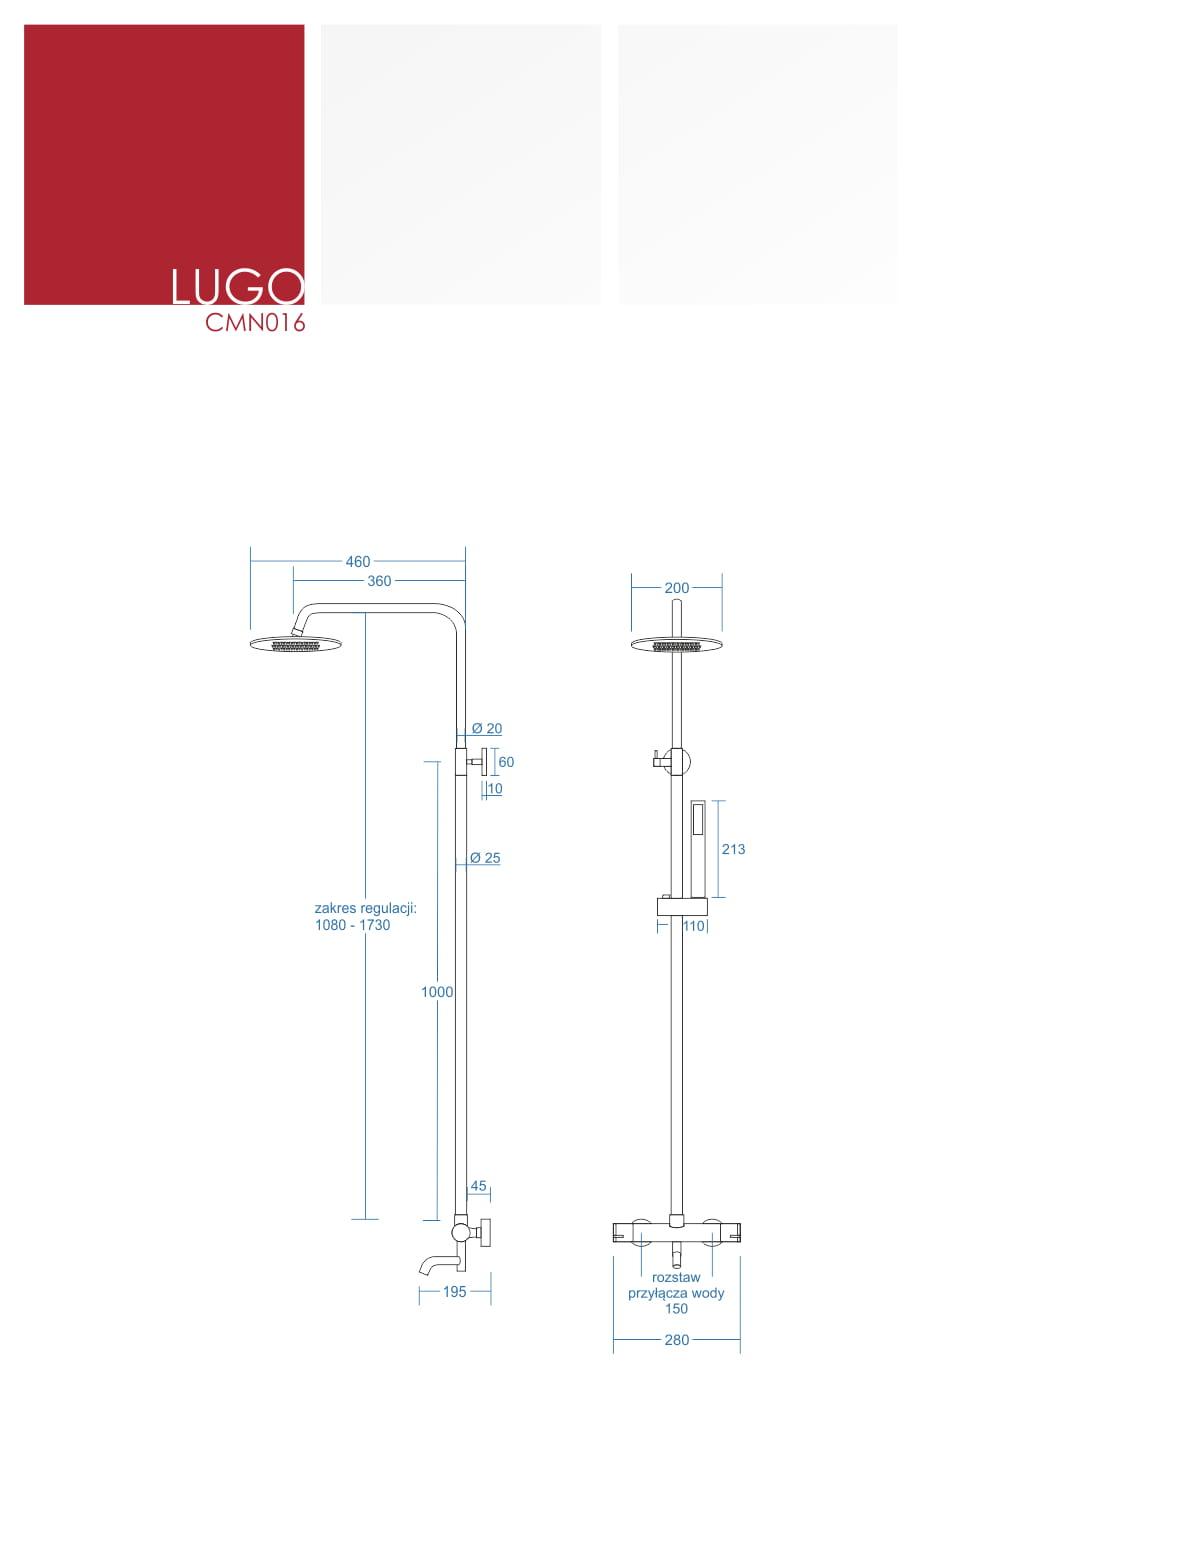 CMN016-LUGO-rys-tech.jpg